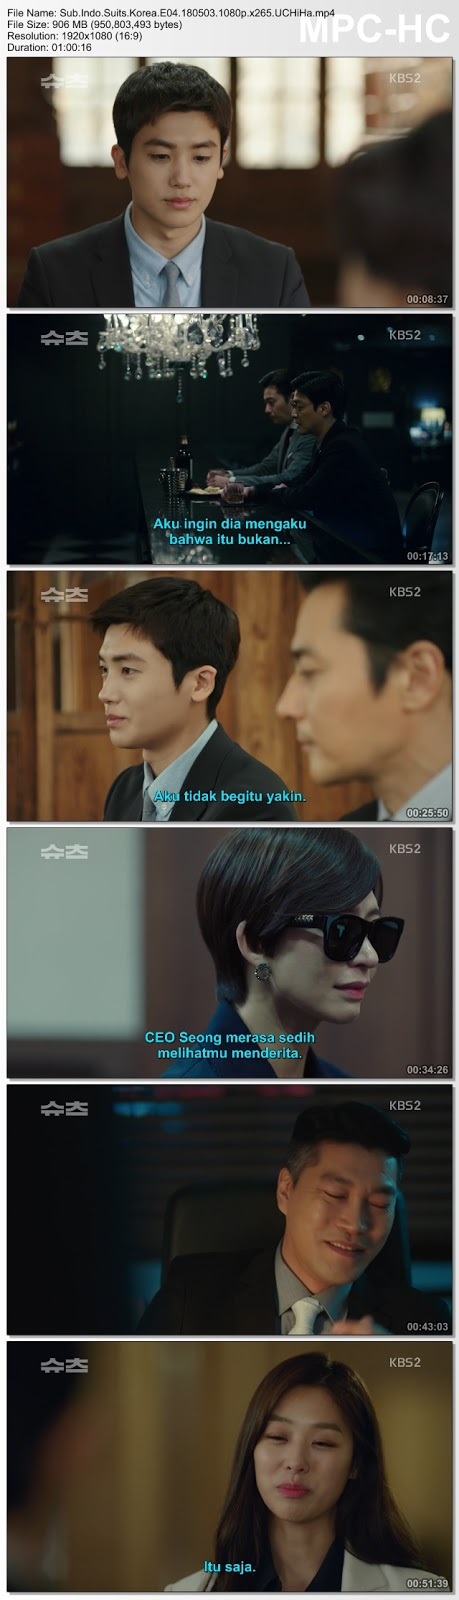 Screenshots Download Drama Korea Suits aka Shucheu aka 슈츠 (2018) Episode 04 HDTV 1080p 720p 480p 3GP MP4 NEXT Subtitle Indonesia Google Drive Free Full Movie Online